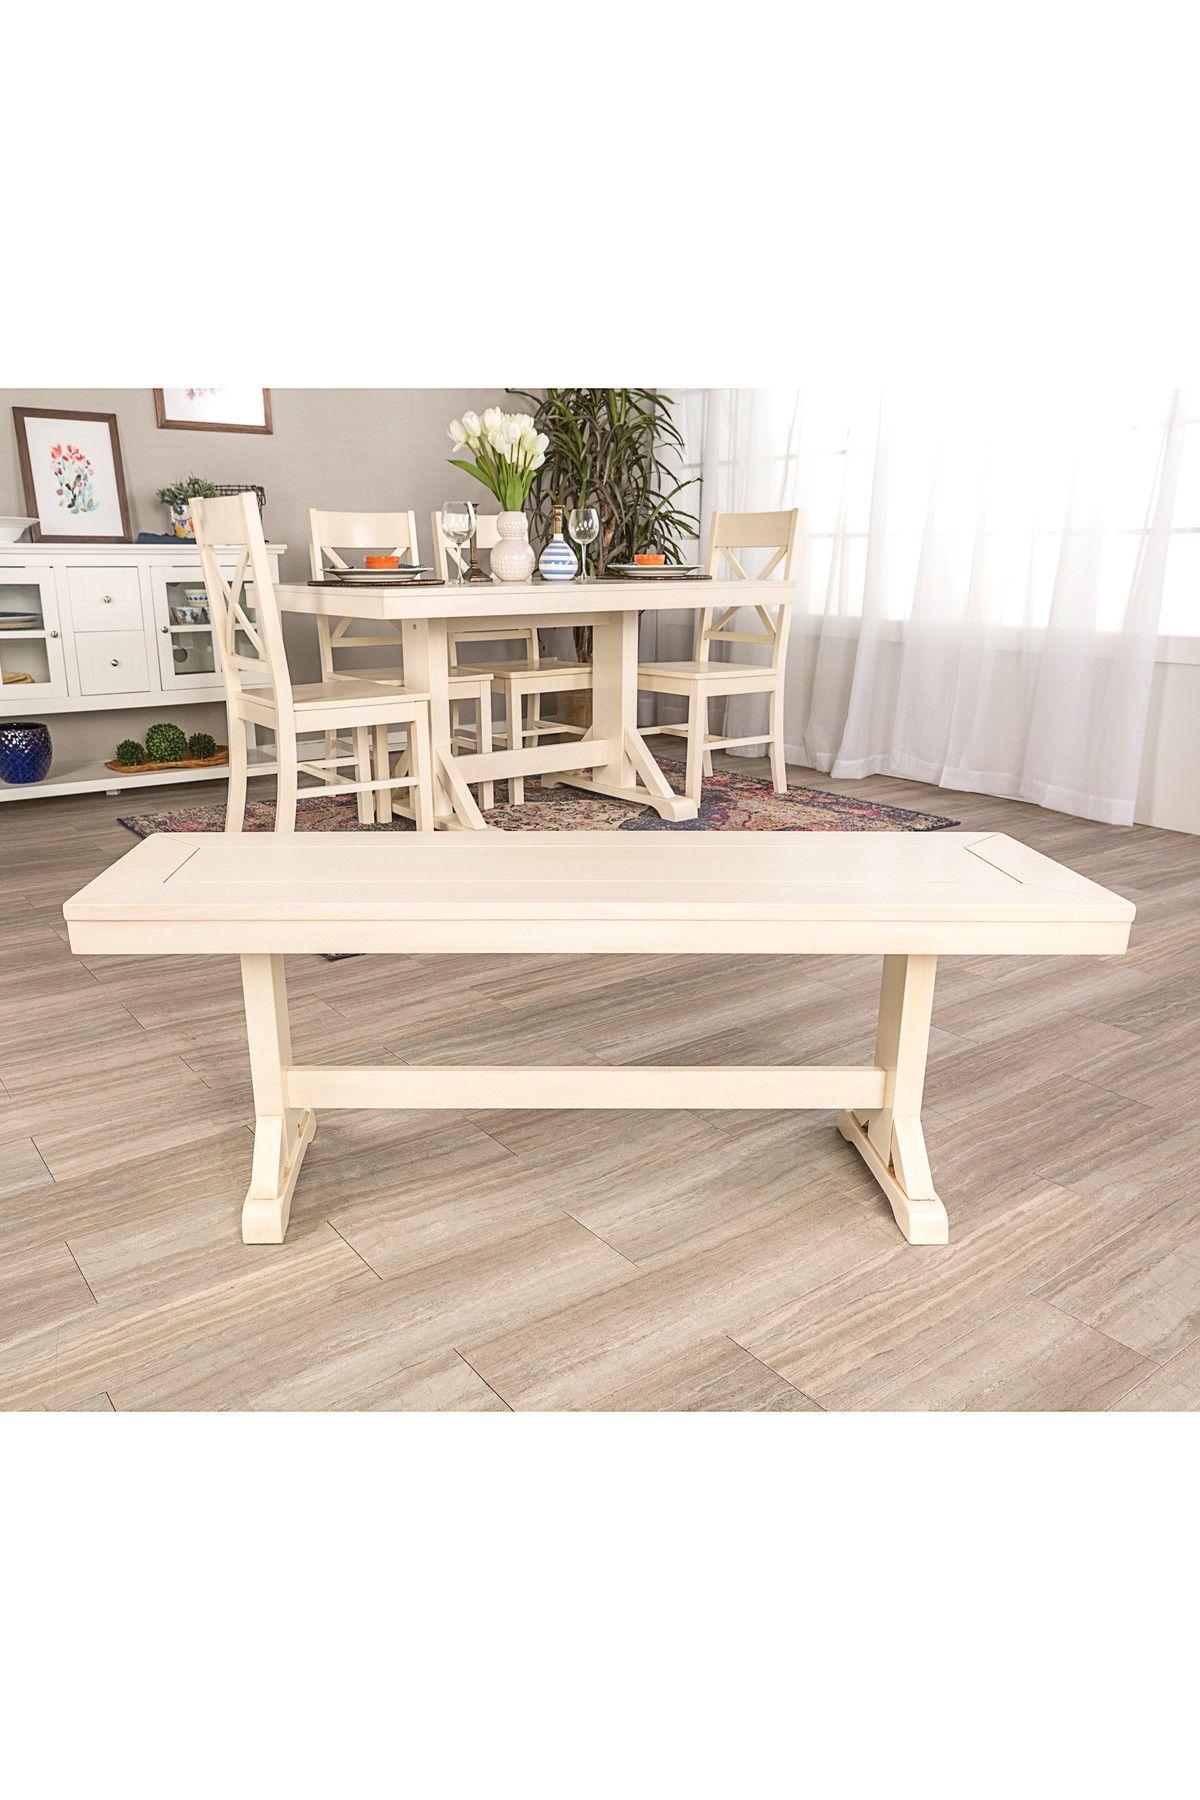 "Walker Edison Furniture pany 48"" Antique White Millwright Wood"